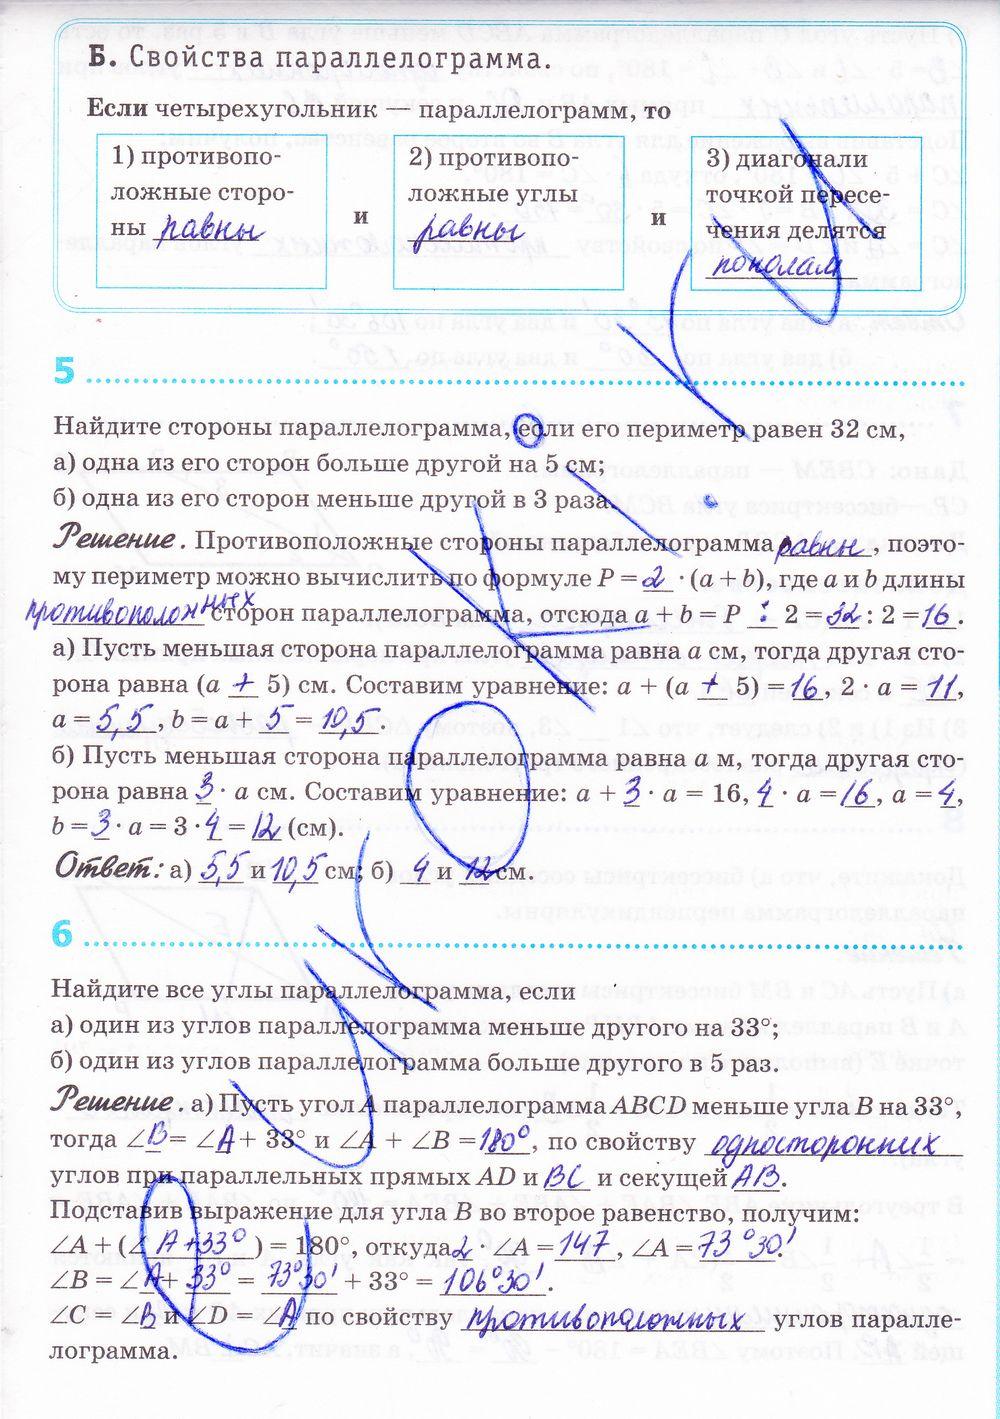 Www.slovo.ws 4 класса чеботаревская дрозд столяр 2018 год